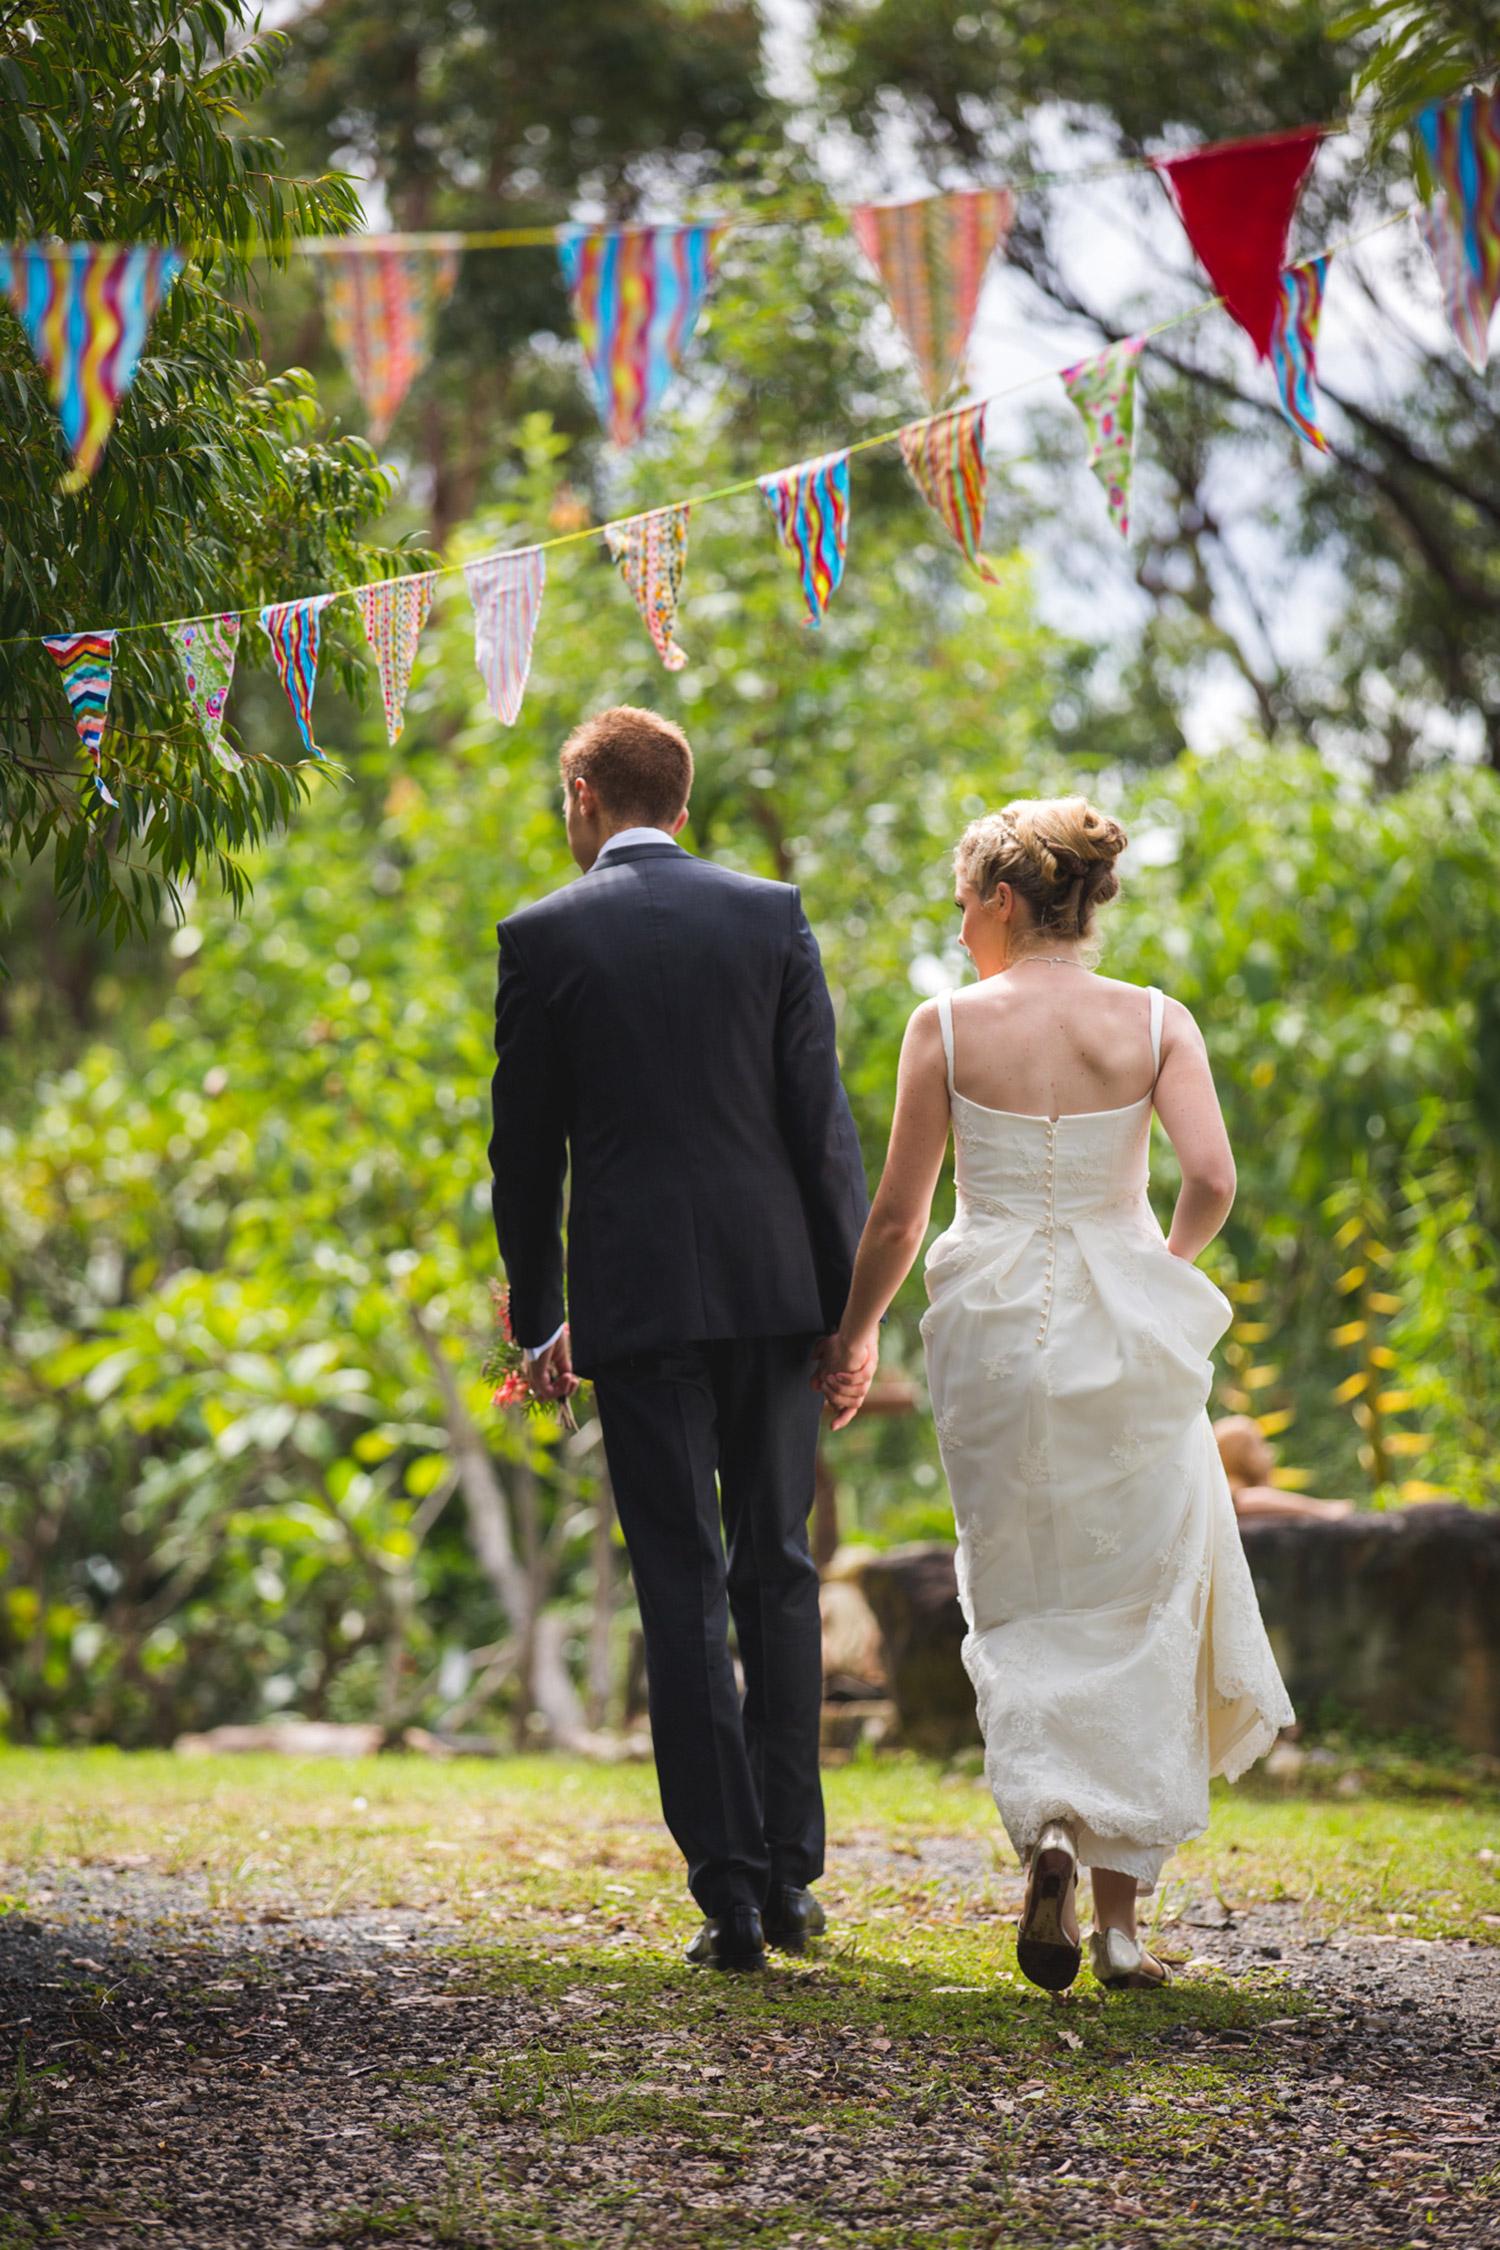 8-sunshine-coast-wedding-photography-all-the-love-in-the-world-noosa-mooloolaba-glasshouse-brisbane-katie-ryan5428.jpg